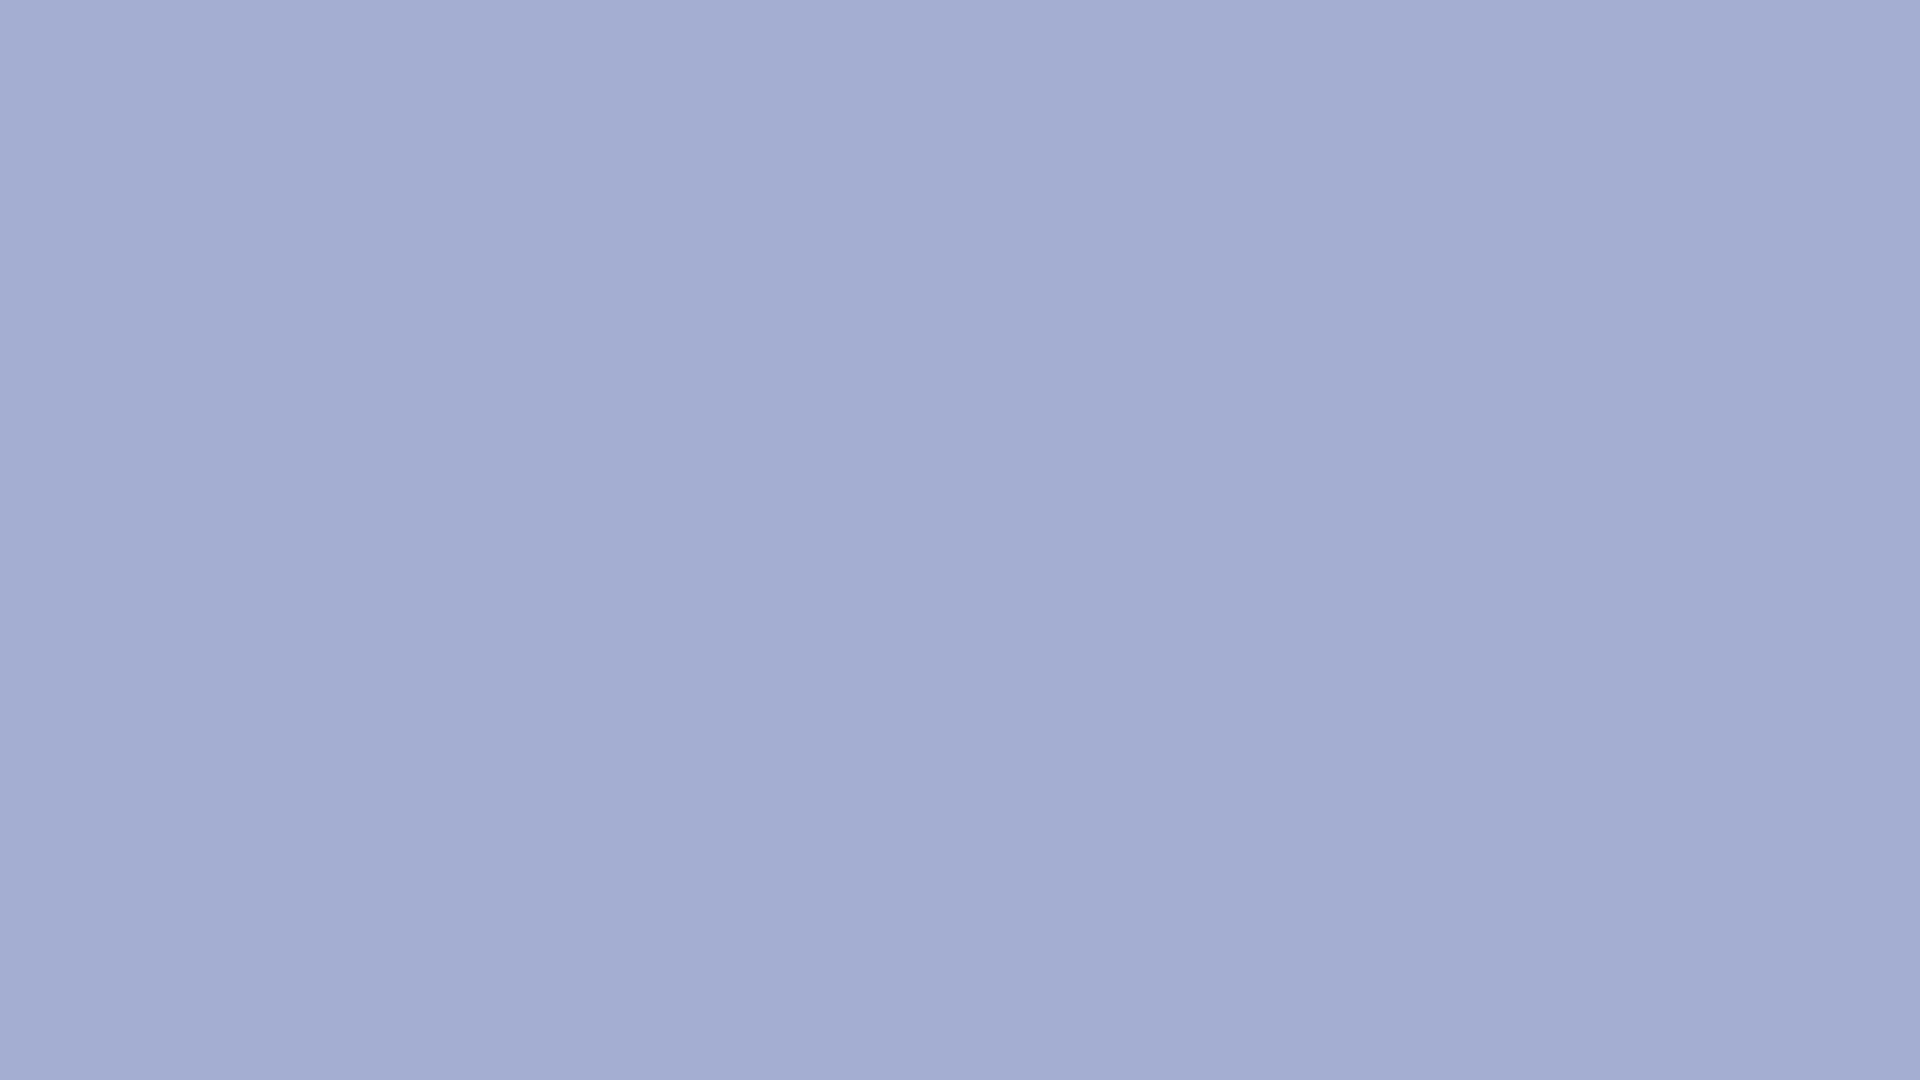 1920x1080 Wild Blue Yonder Solid Color Background